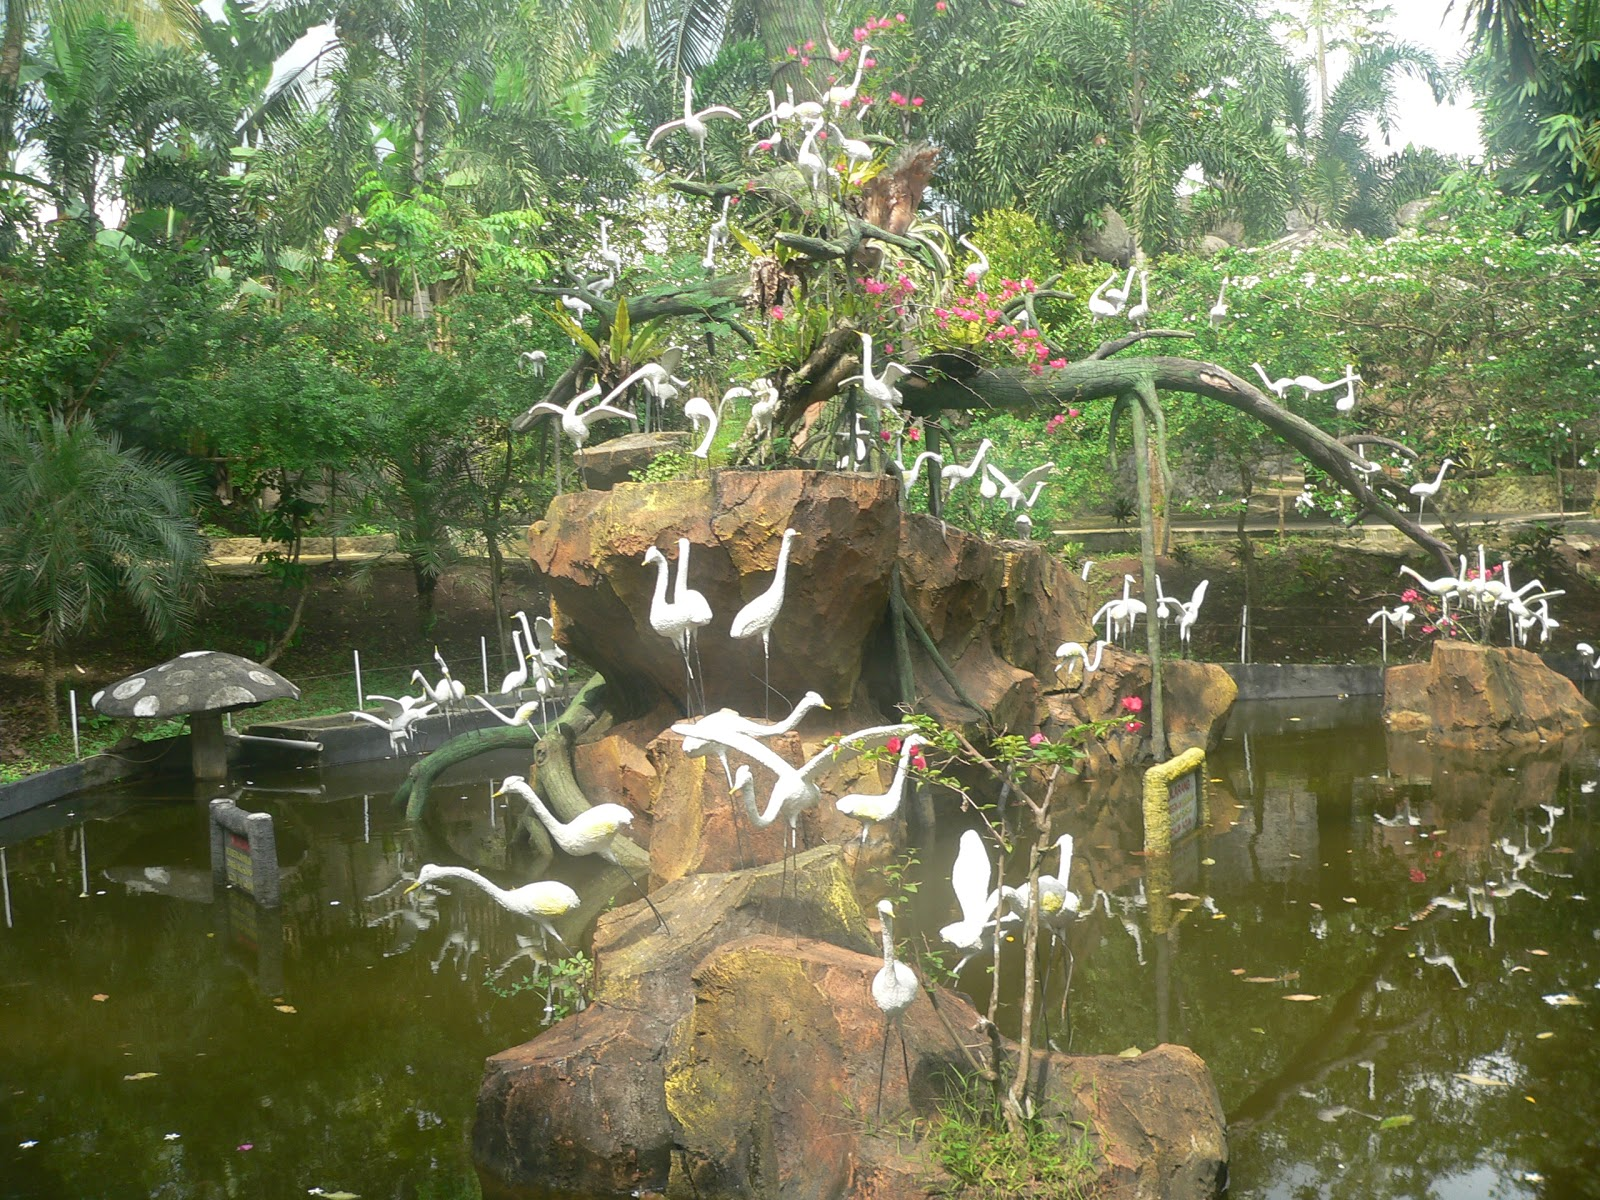 Jalan-jalan ke CAS Waterpark Cikole Pandeglang - BatikBesurek.Com on